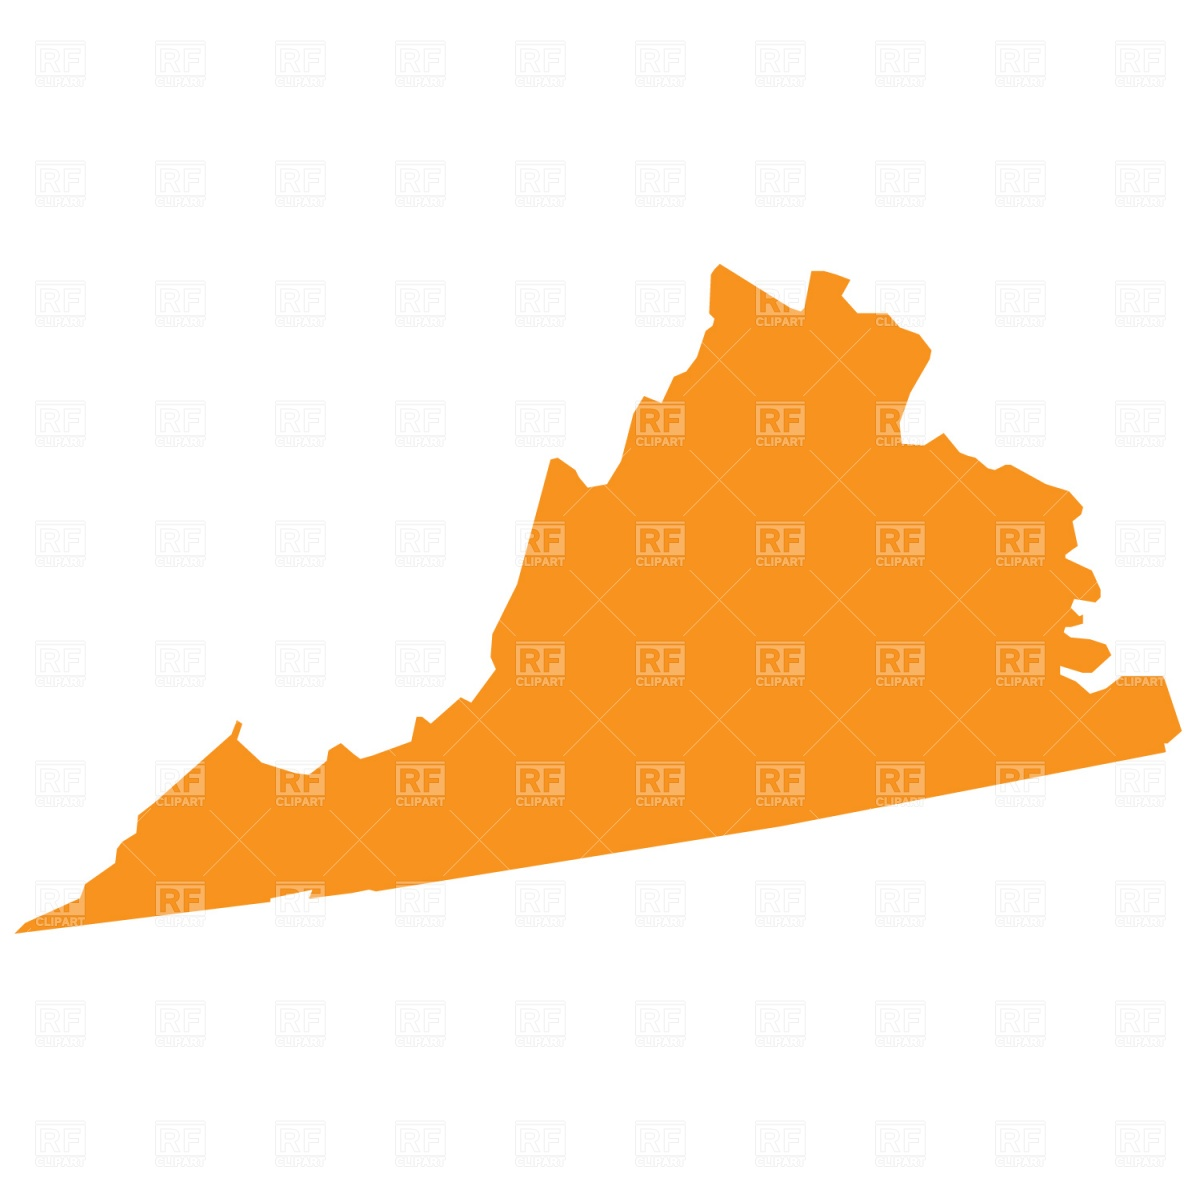 Virginia state map clipart clipart Virginia state clipart - ClipartFest clipart